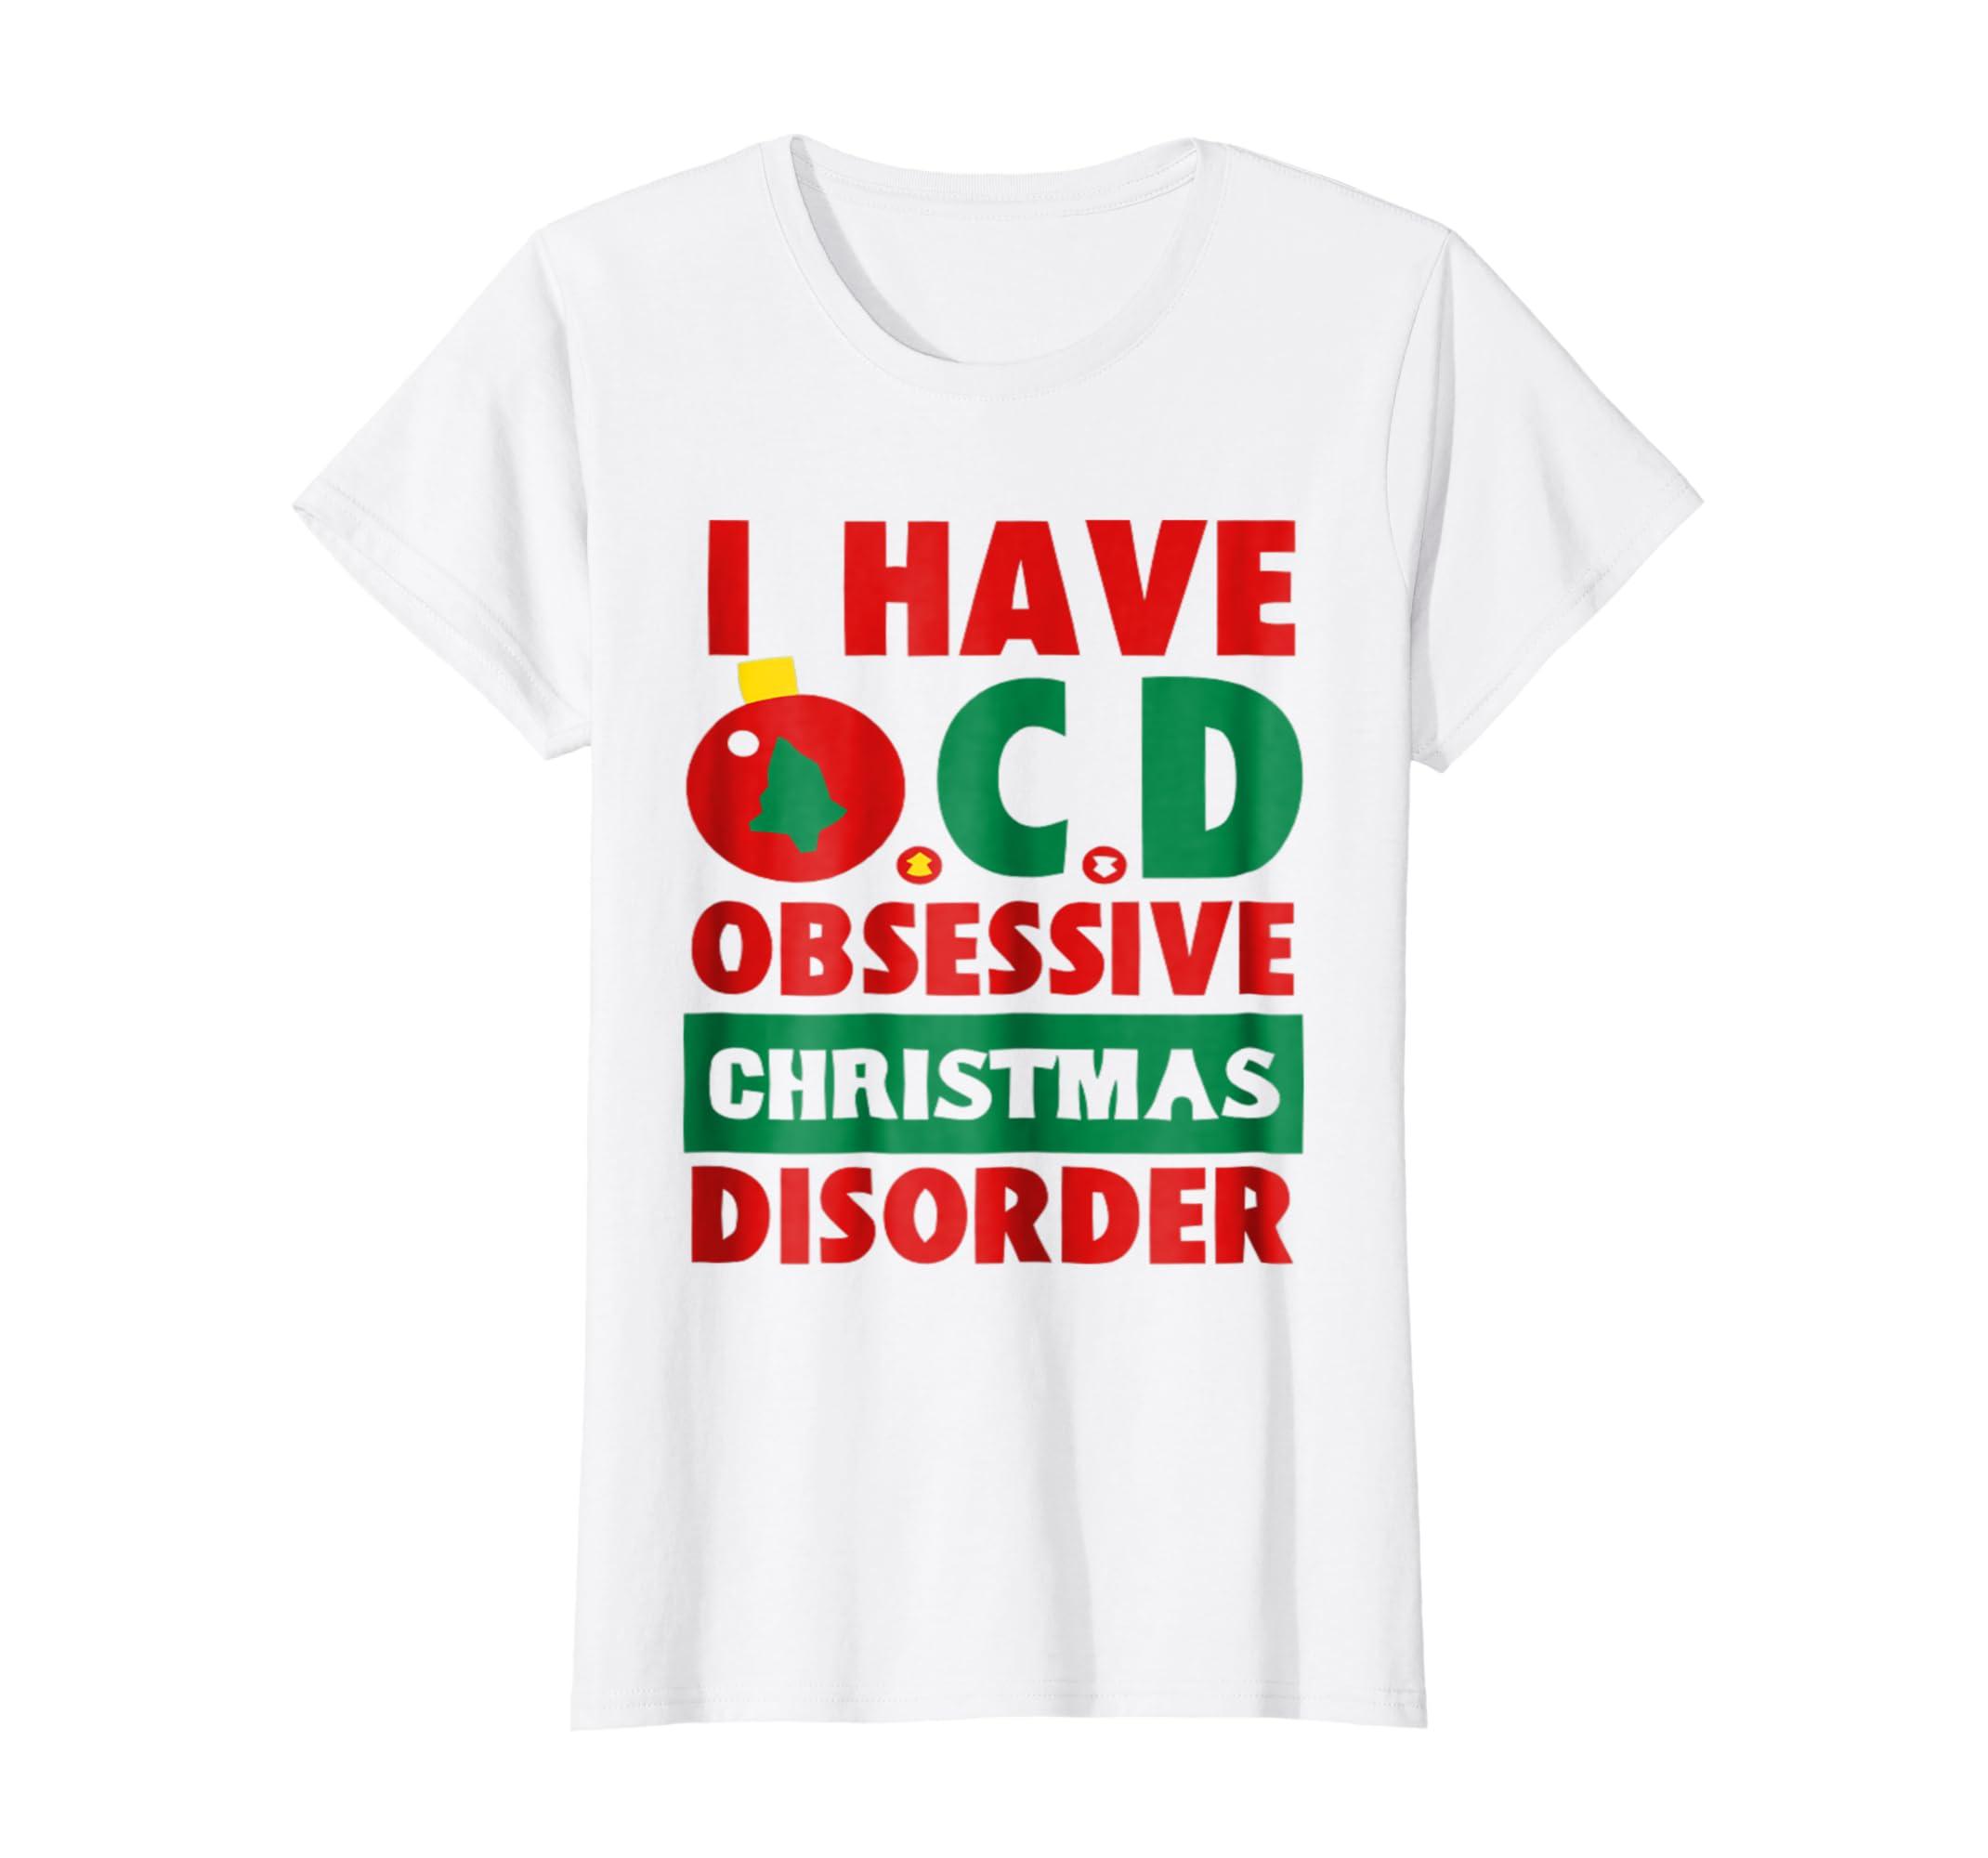 Amazon.com: I HAVE O.C.D OBSESSIVE CHRISTMAS DISORDER Tshirt: Clothing